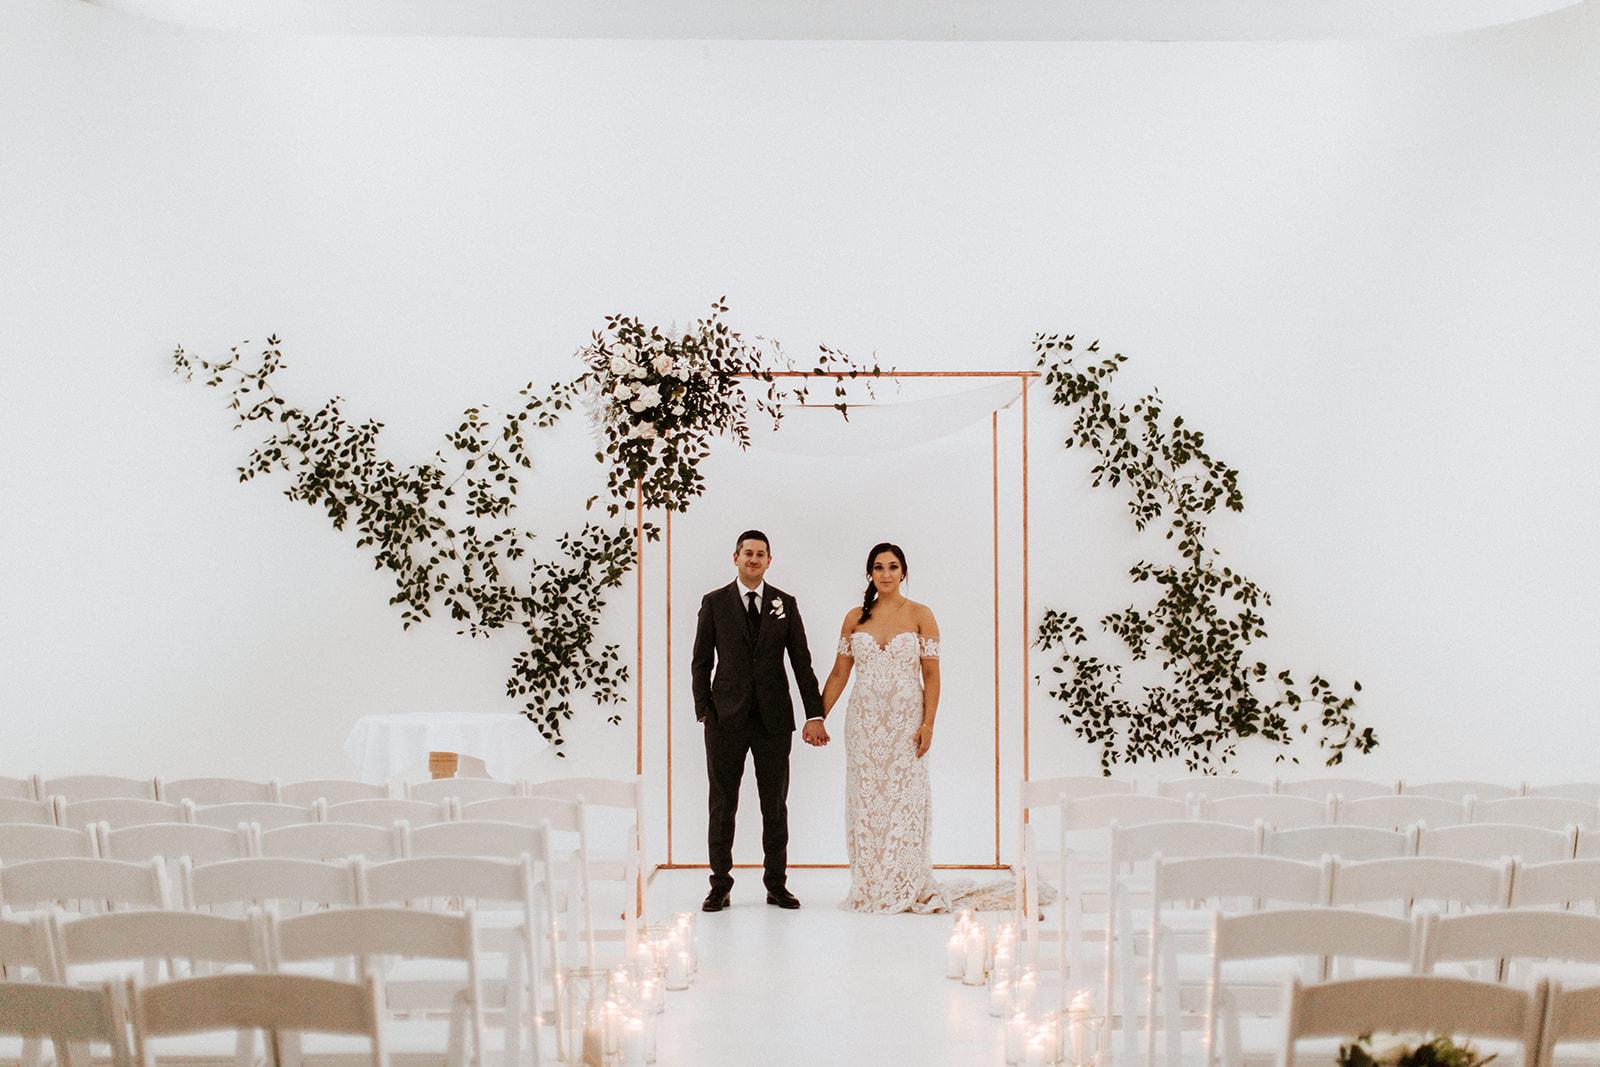 SHAUNA + JUSTIN <strong>BEAUTIFUL BOTANICAL WEDDING</strong>